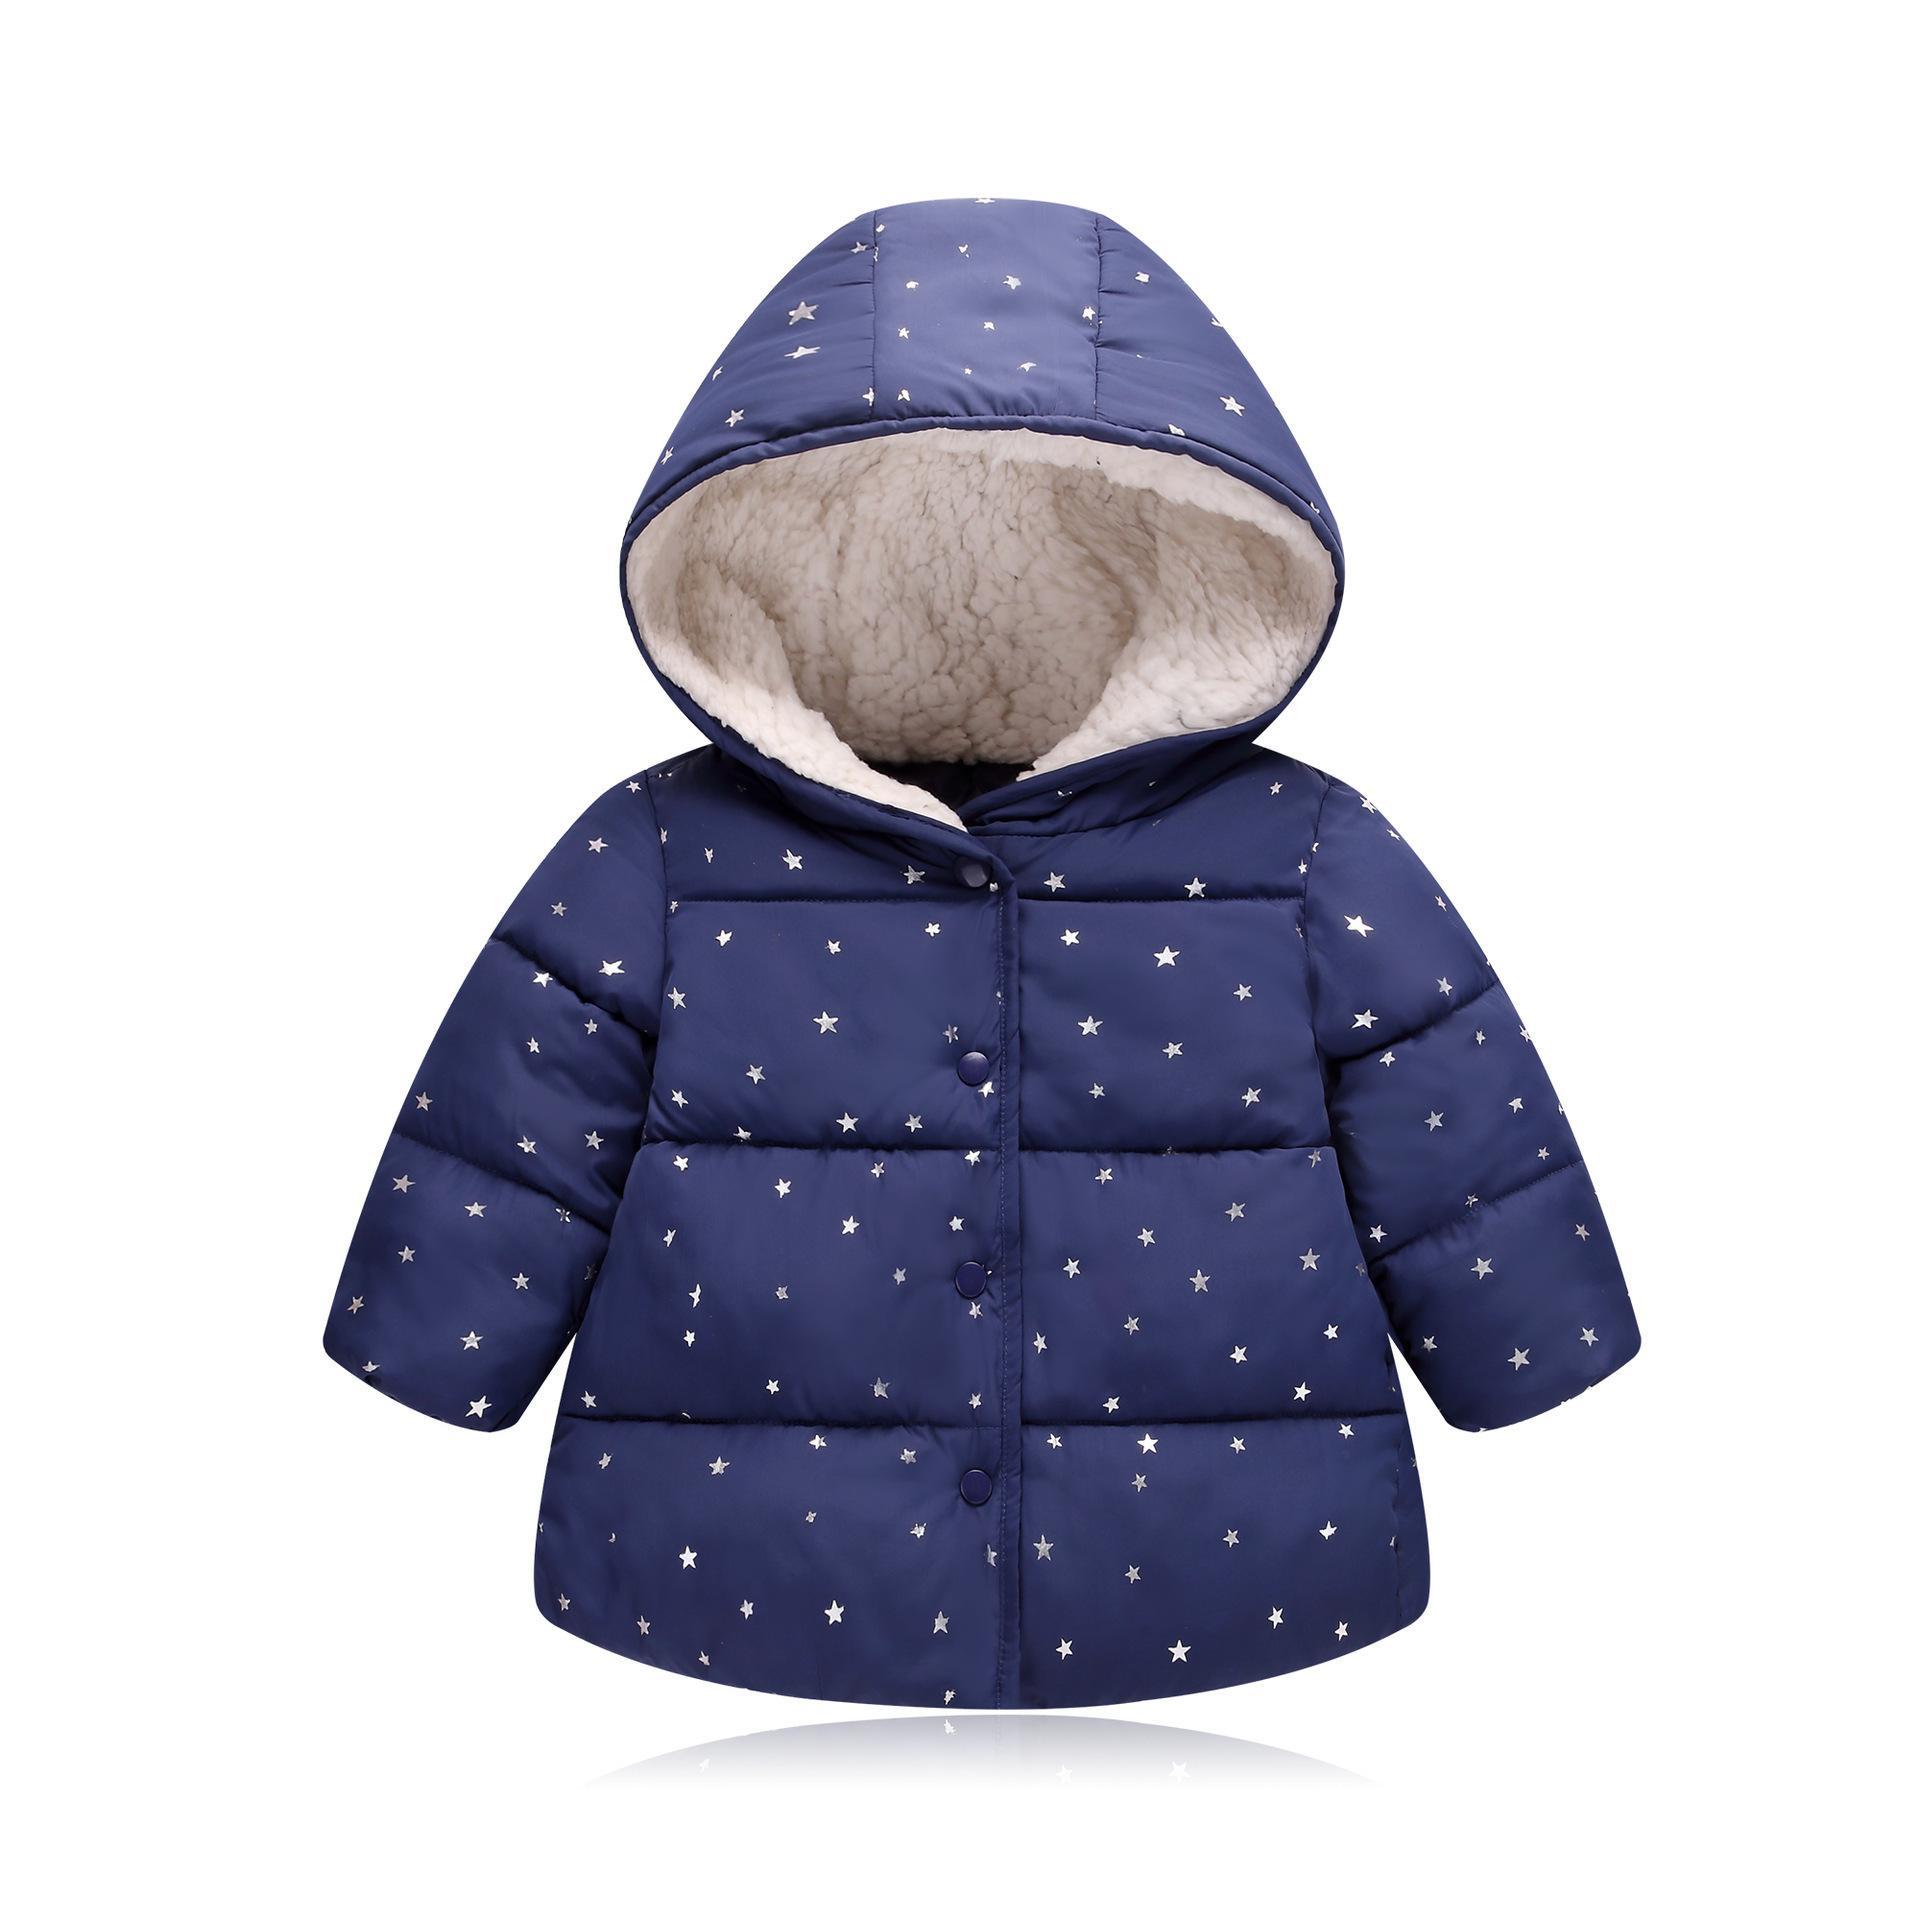 b42657bd5e59 Good Qulaity Boys Coats 2019 Fashion Winter Warm Thick Fleece Velvet ...